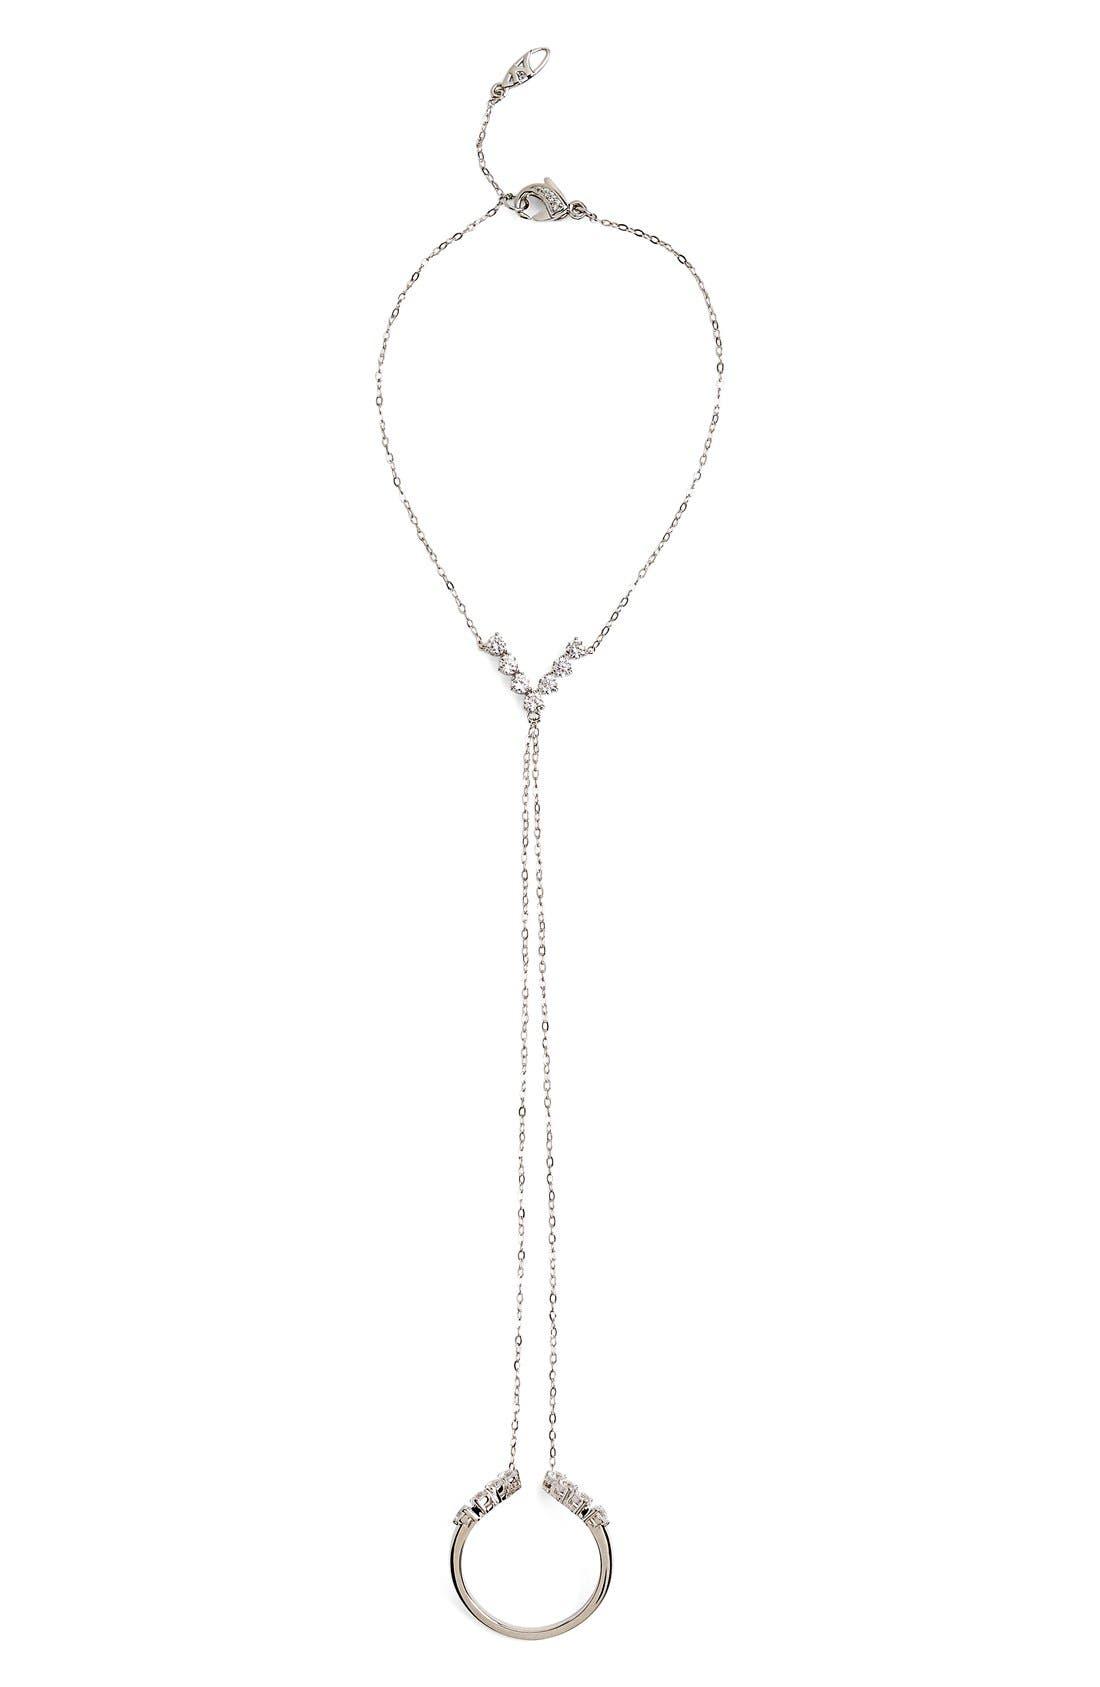 Nadri 'Salome' Cubic Zirconia Hand Chain